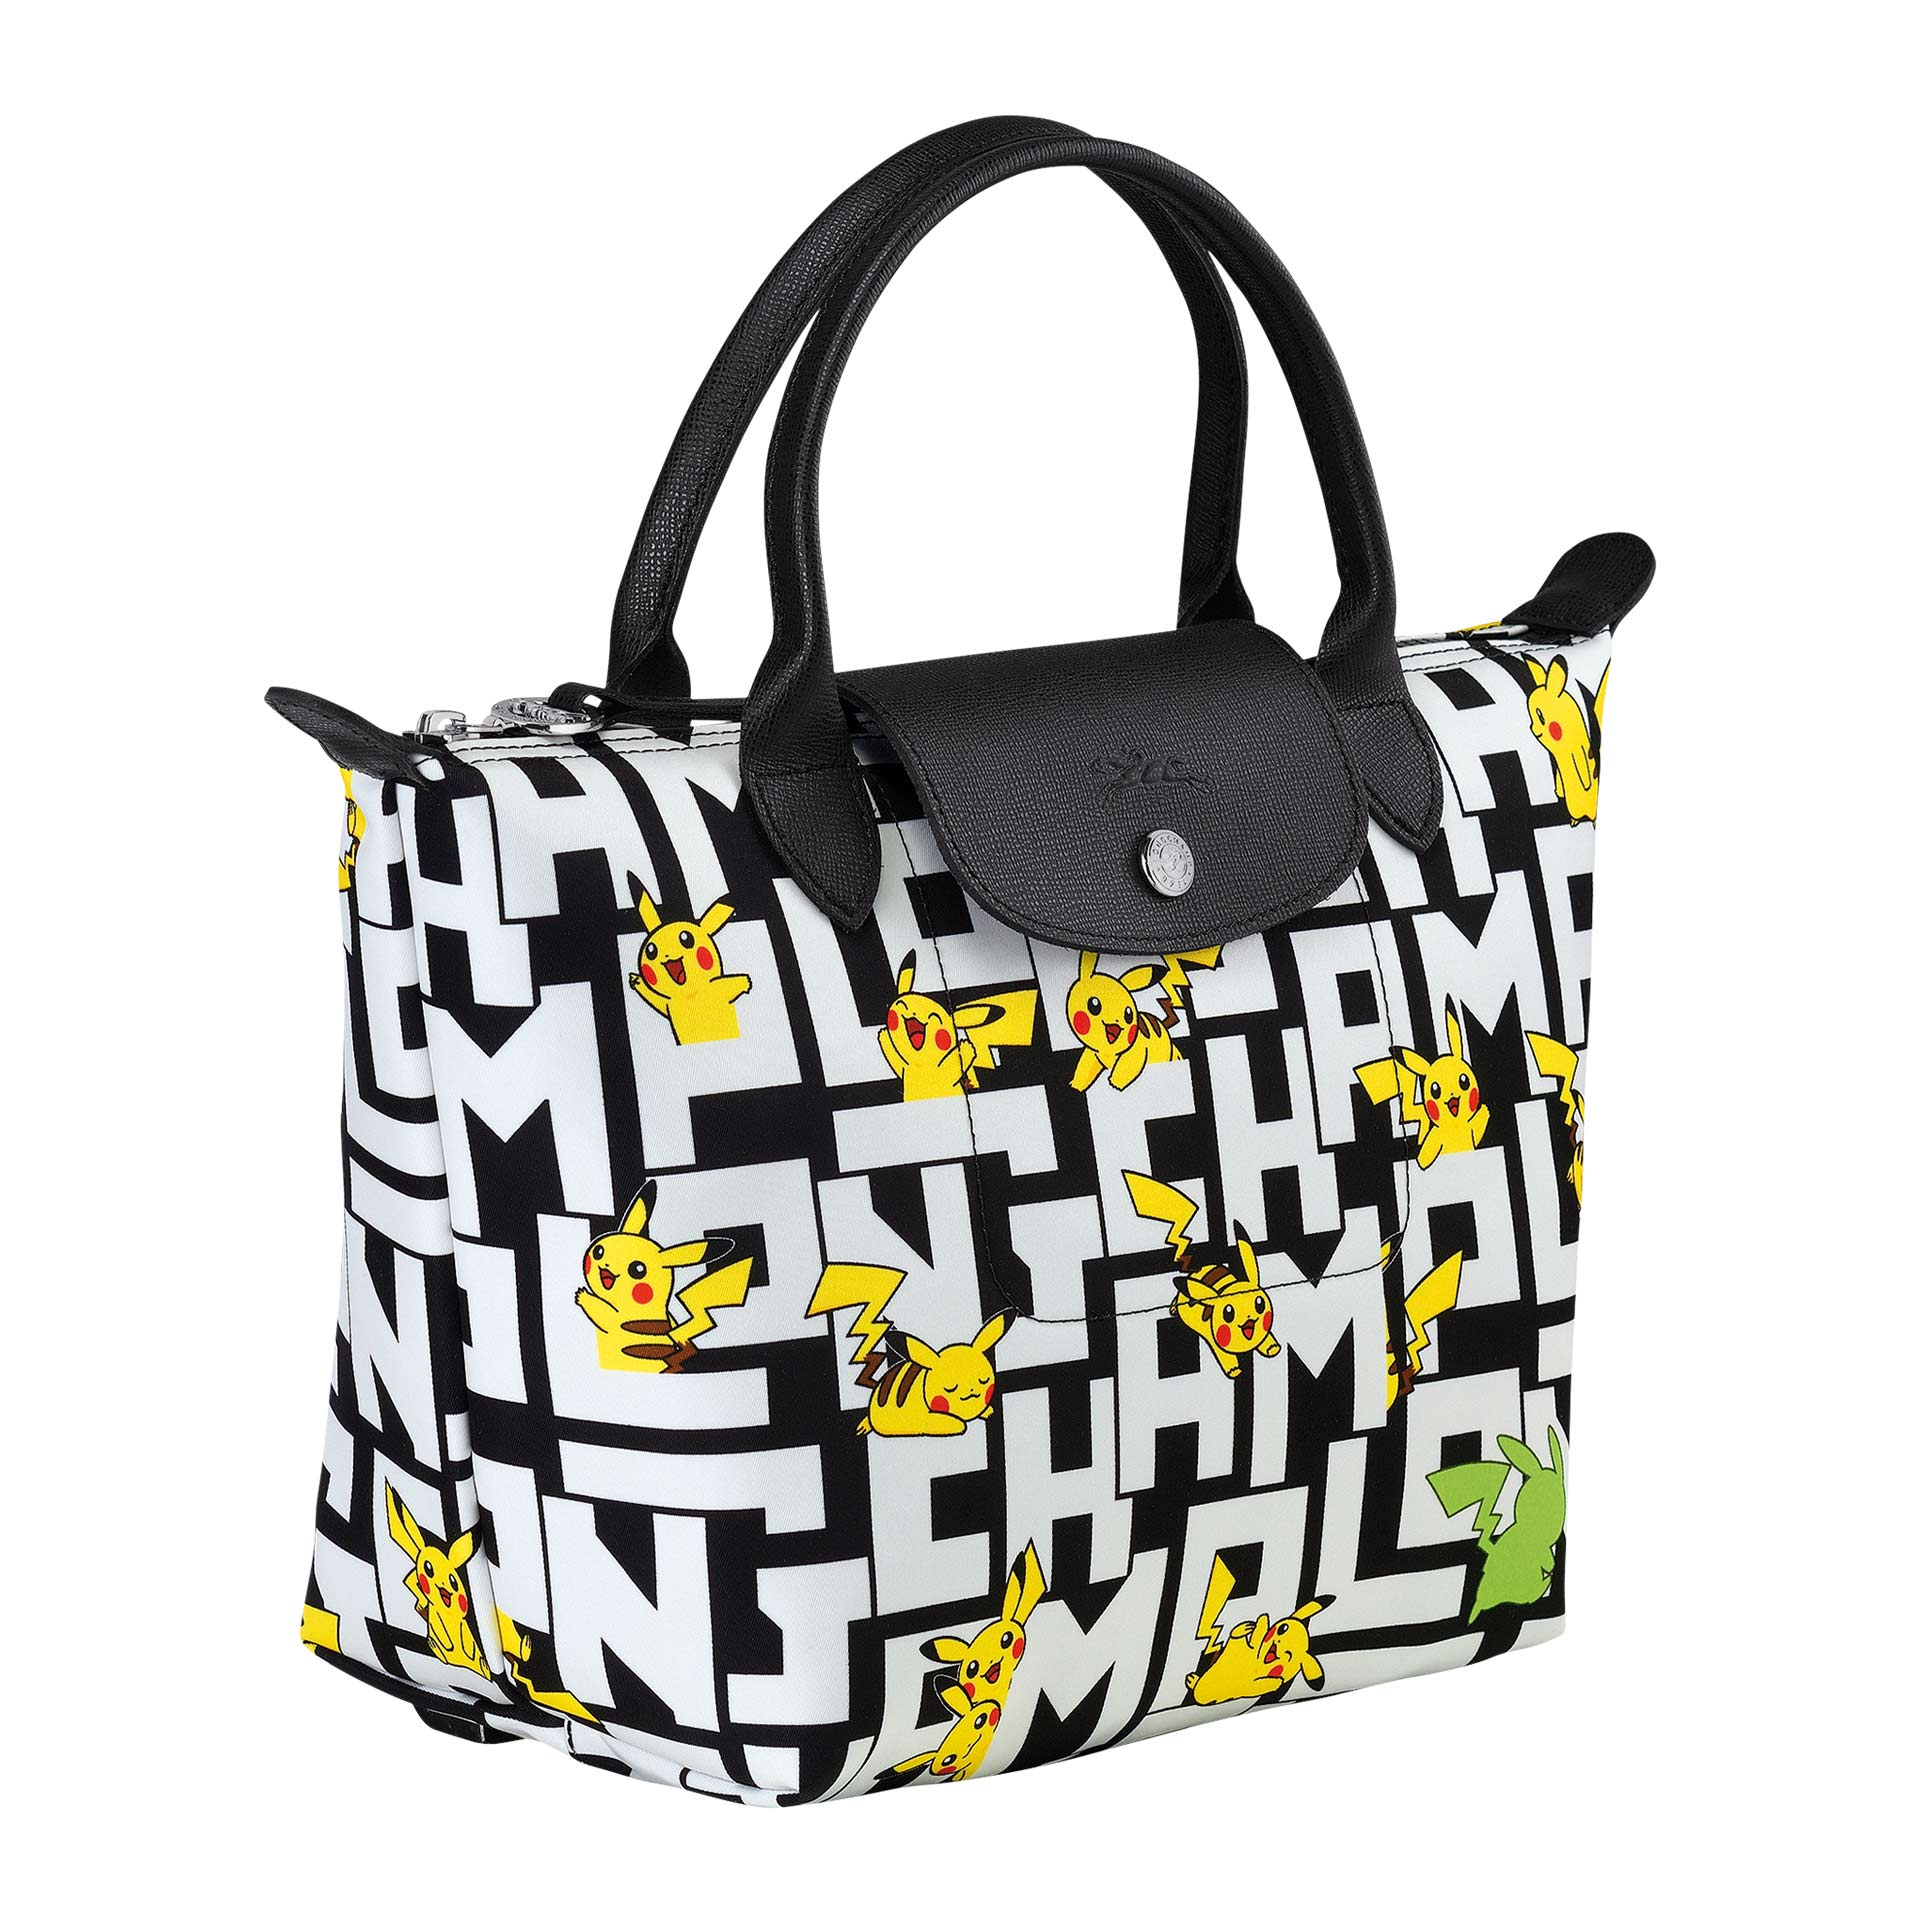 Longchamp Le Pliage Pokemon Handtasche S black/white